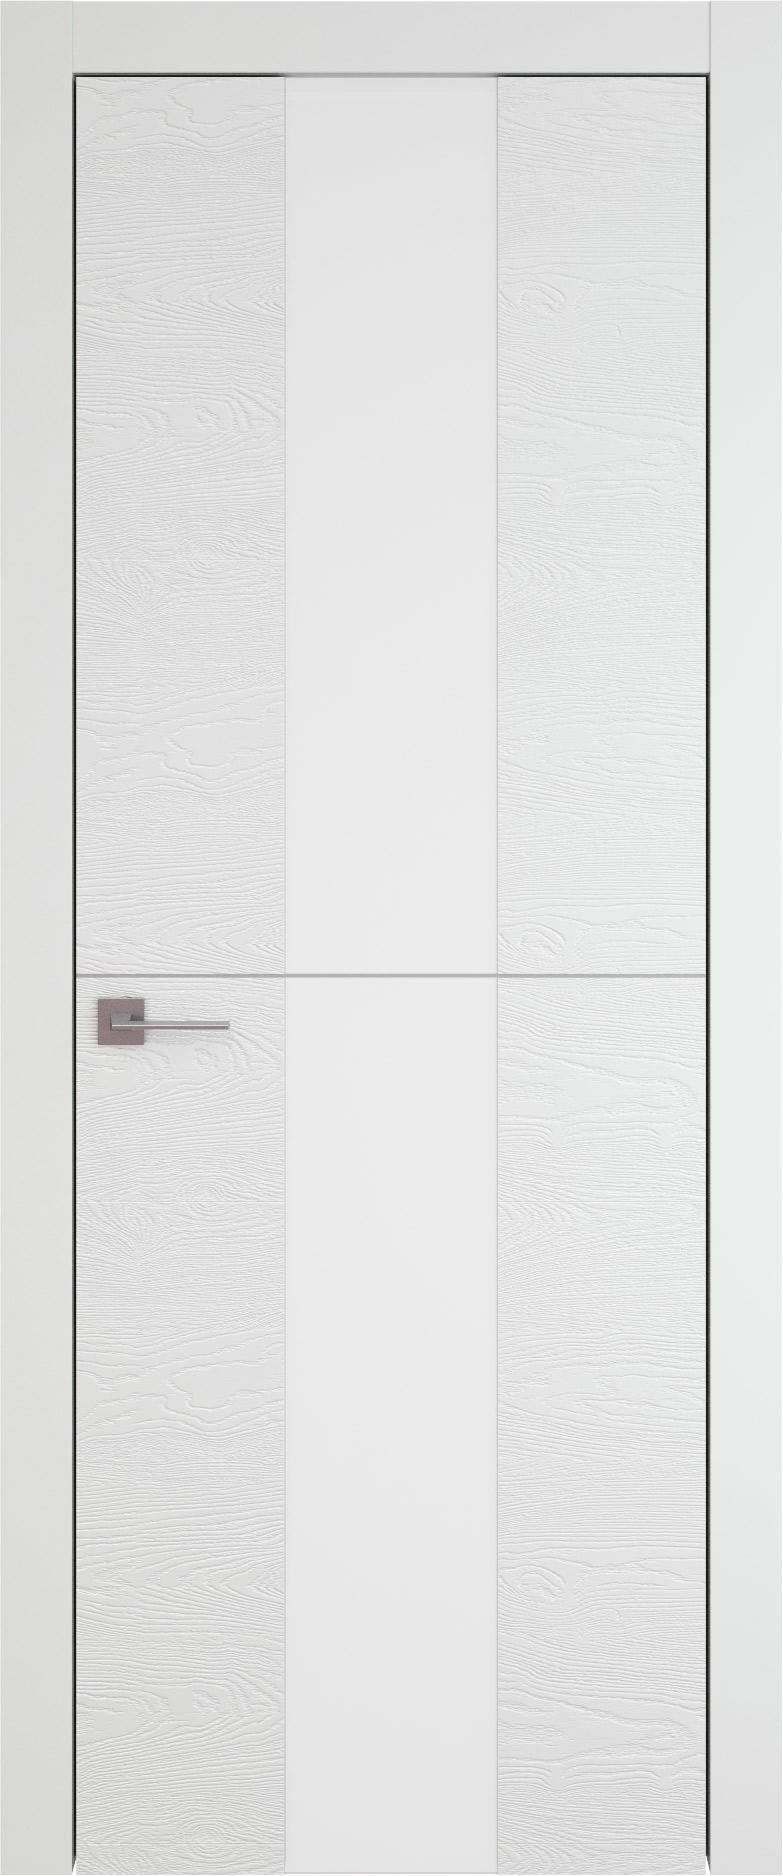 Tivoli Ж-3 цвет - Белая эмаль по шпону (RAL 9003) Со стеклом (ДО)